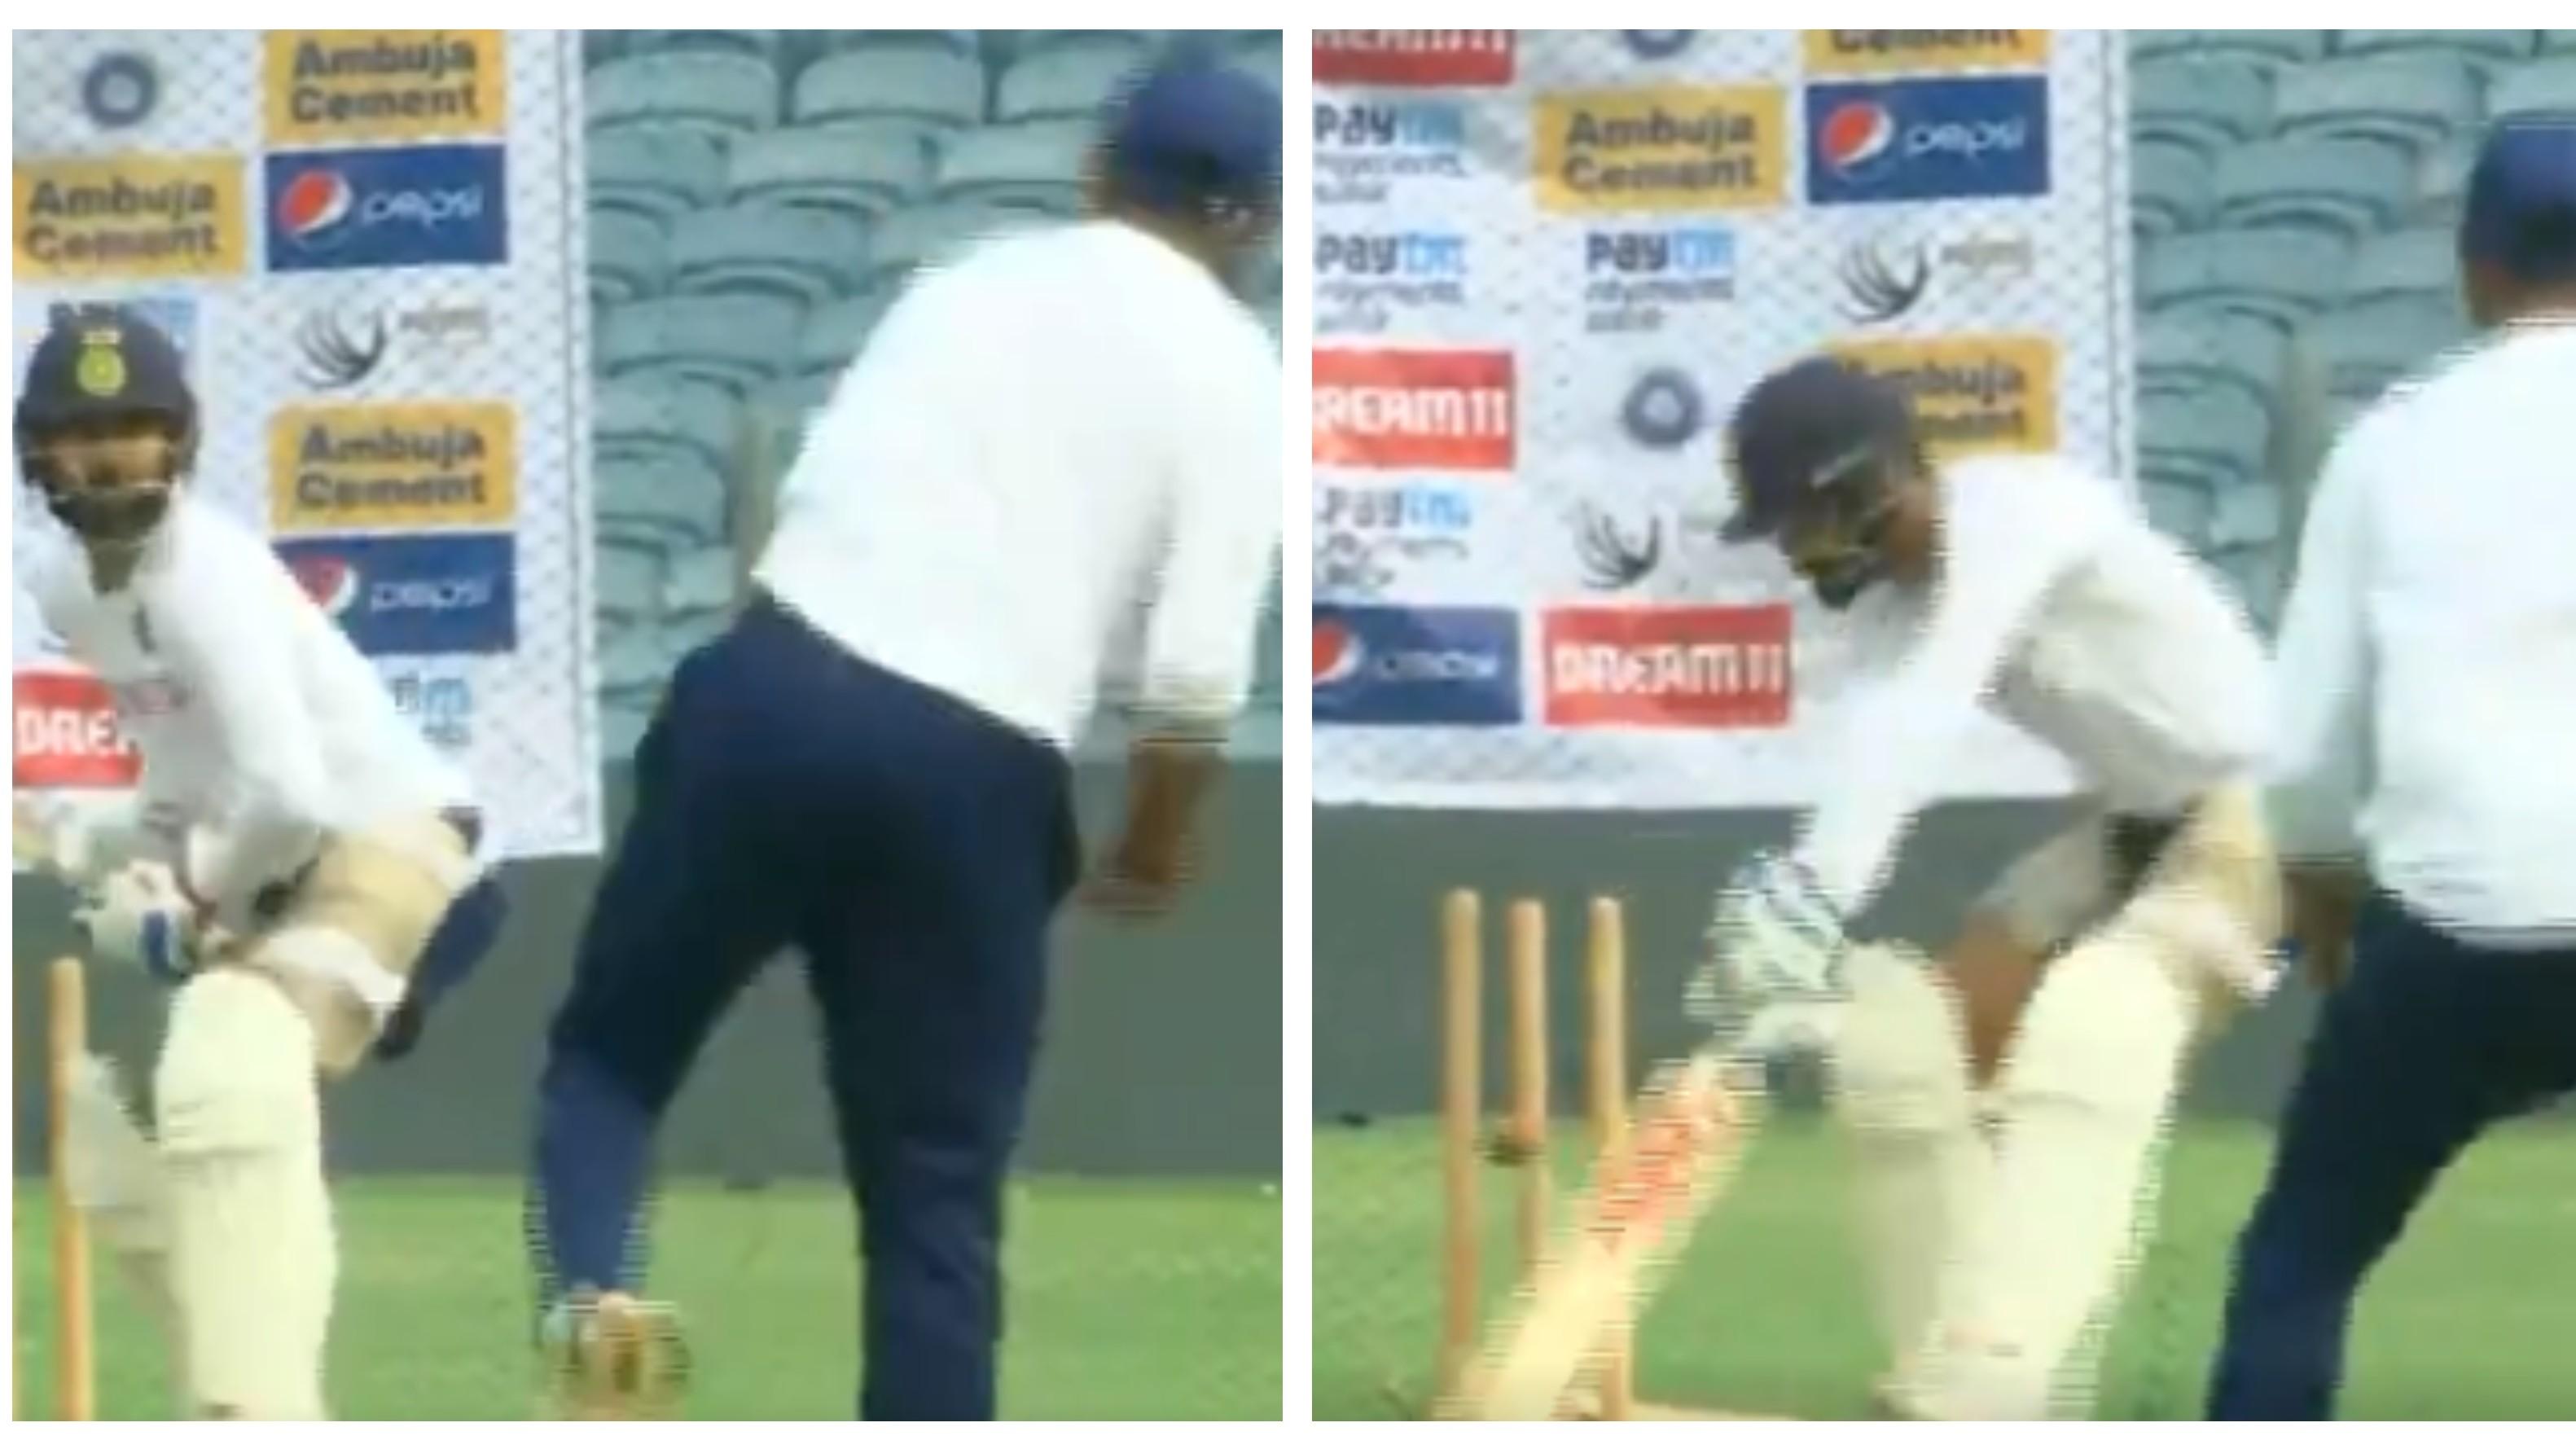 IND v SA 2019: WATCH – Ravindra Jadeja outsmarts Virat Kohli at the nets ahead of Pune Test